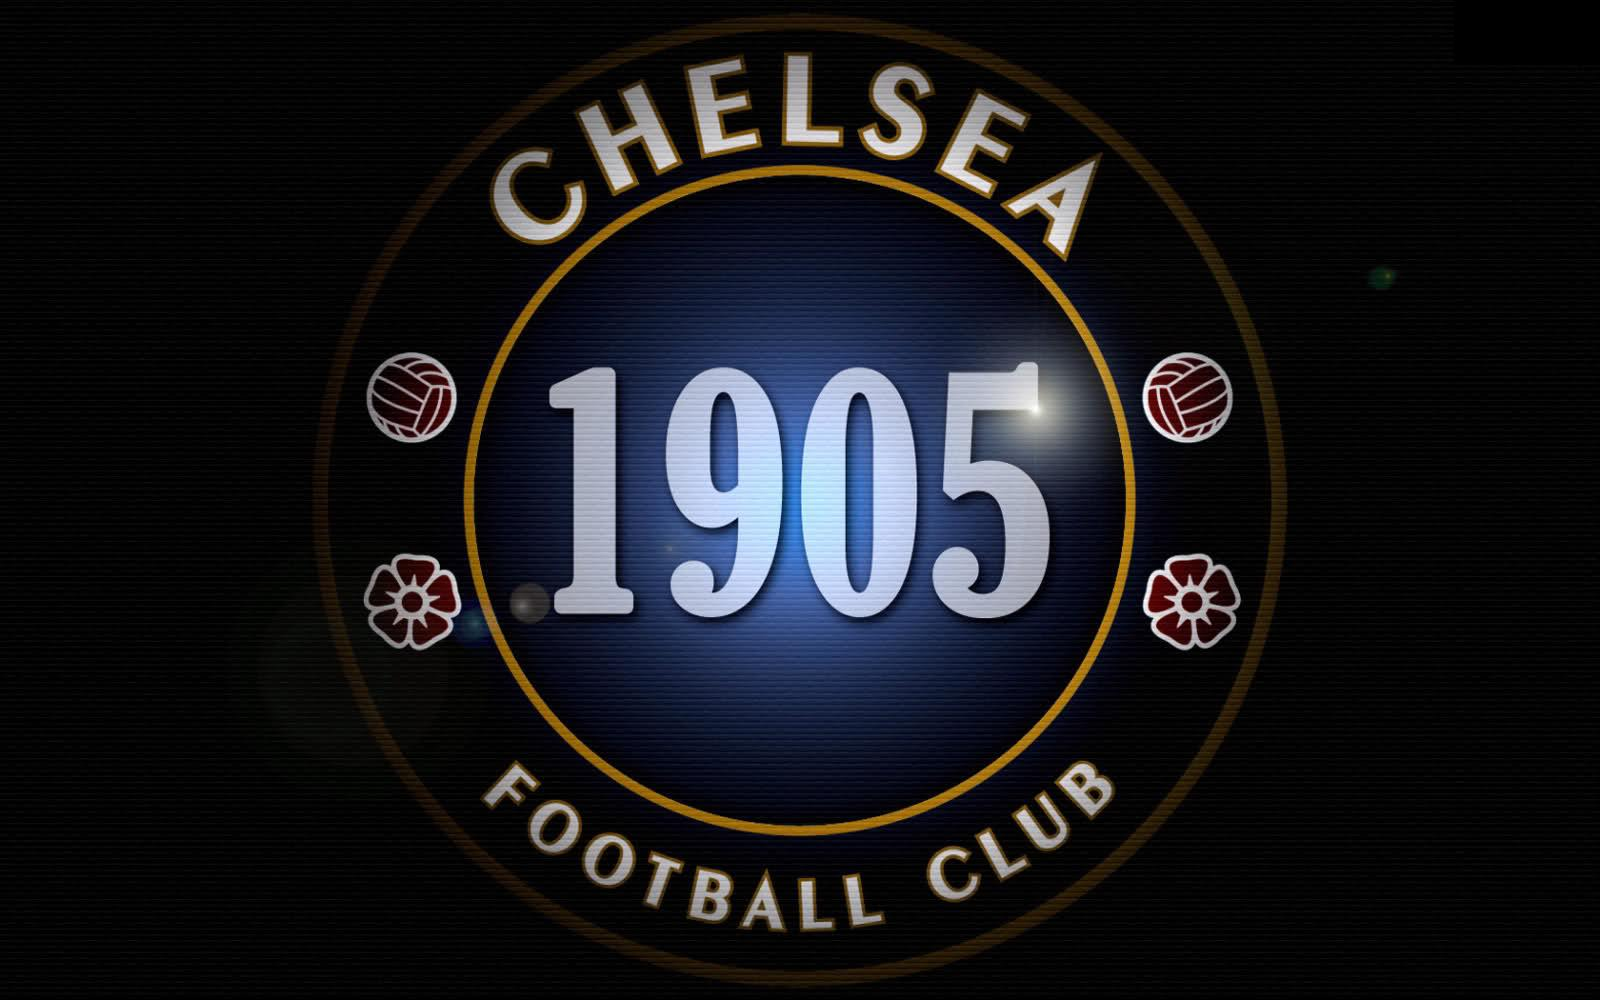 Imágenes Del Chelsea Football Club (Inglaterra)